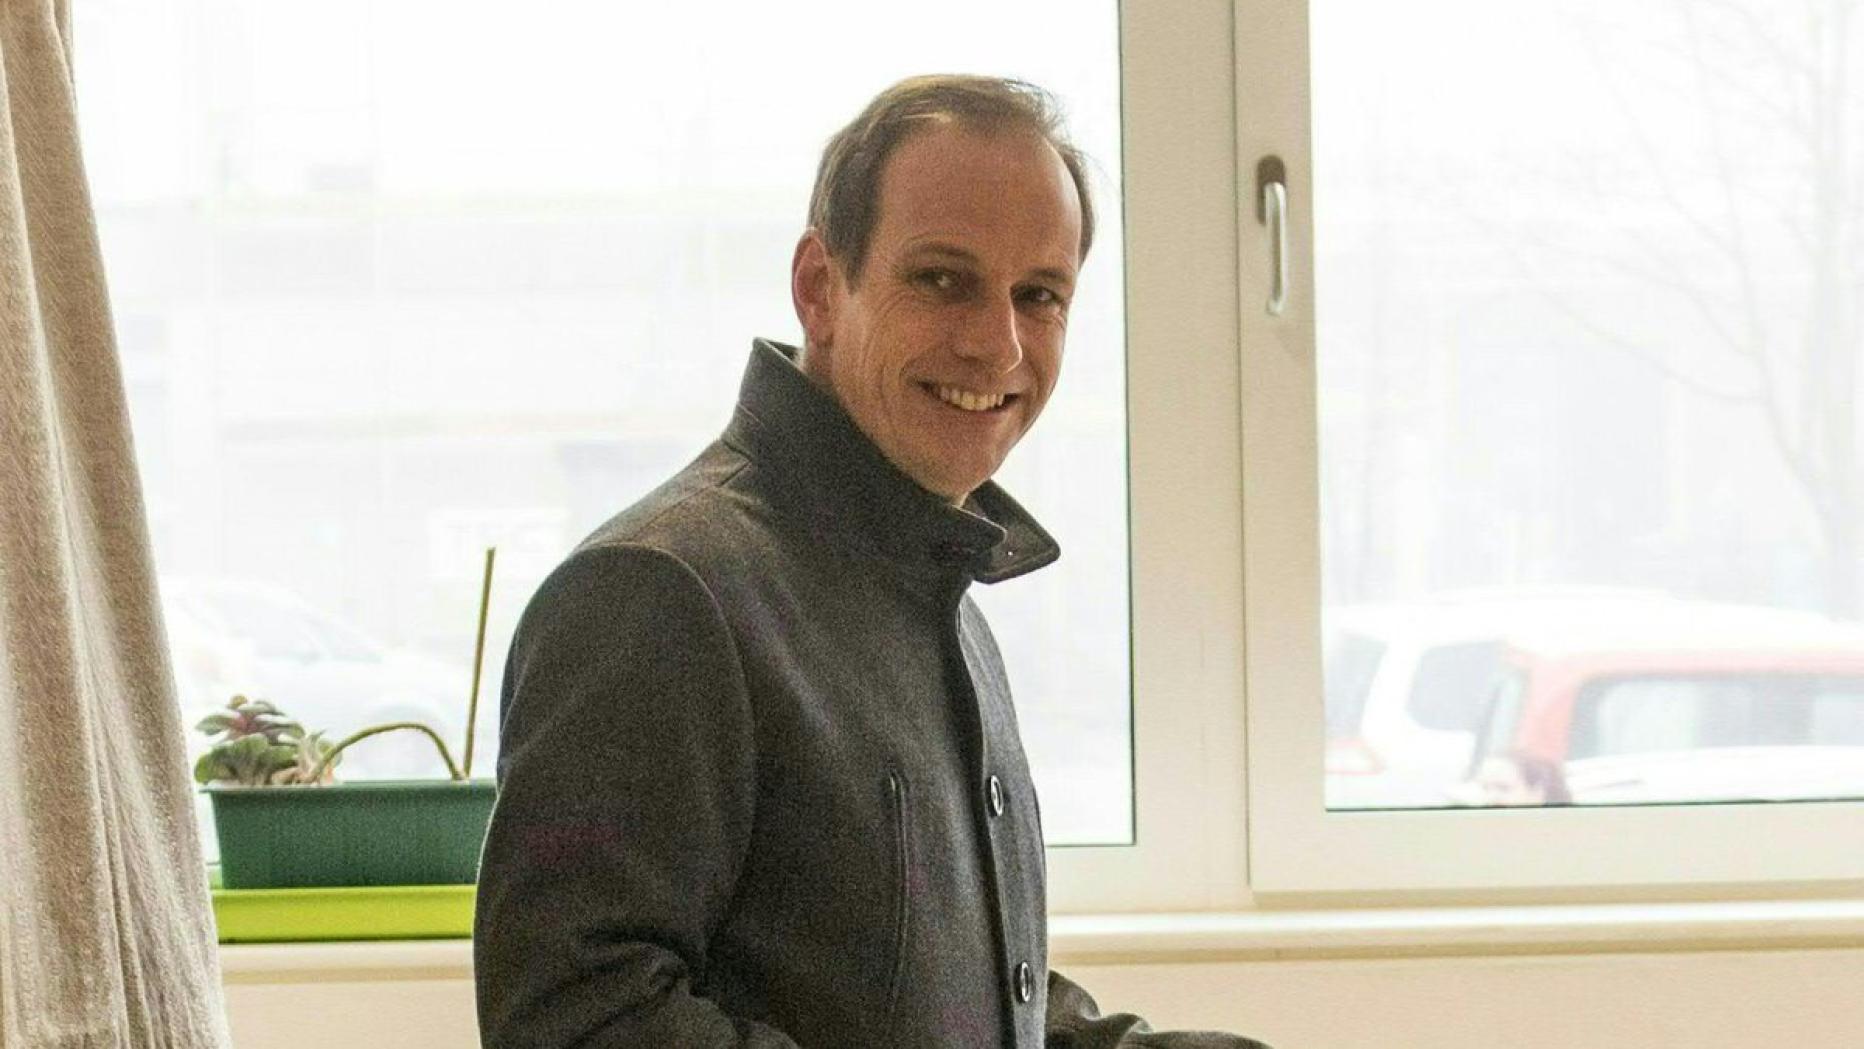 Partnersuche Kostenlos Hohenems Johann